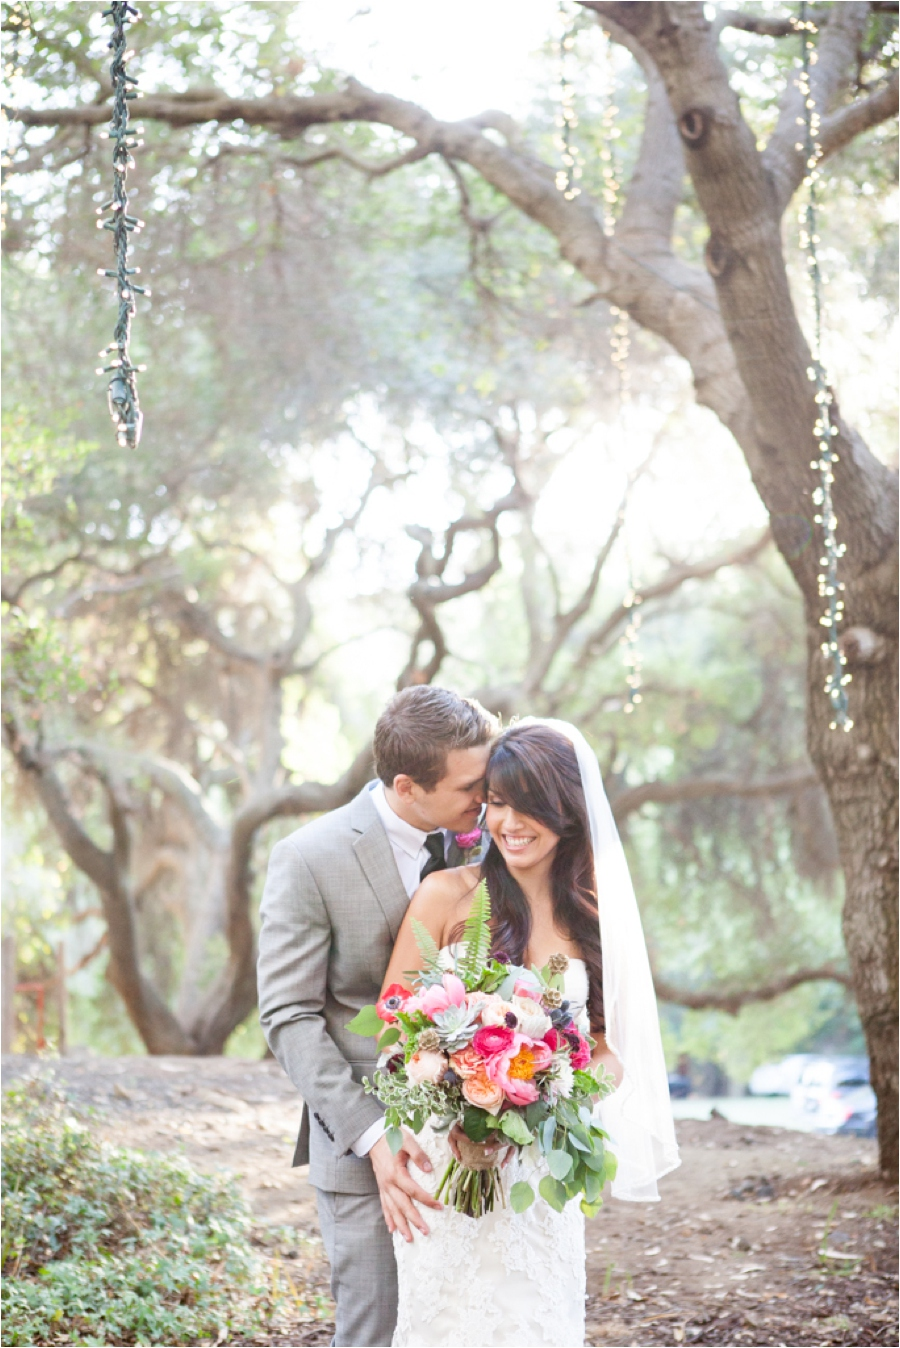 Jasmine and Donny- Calamigos Ranch Wedding ©Shaun and Skyla Walton-283.jpg